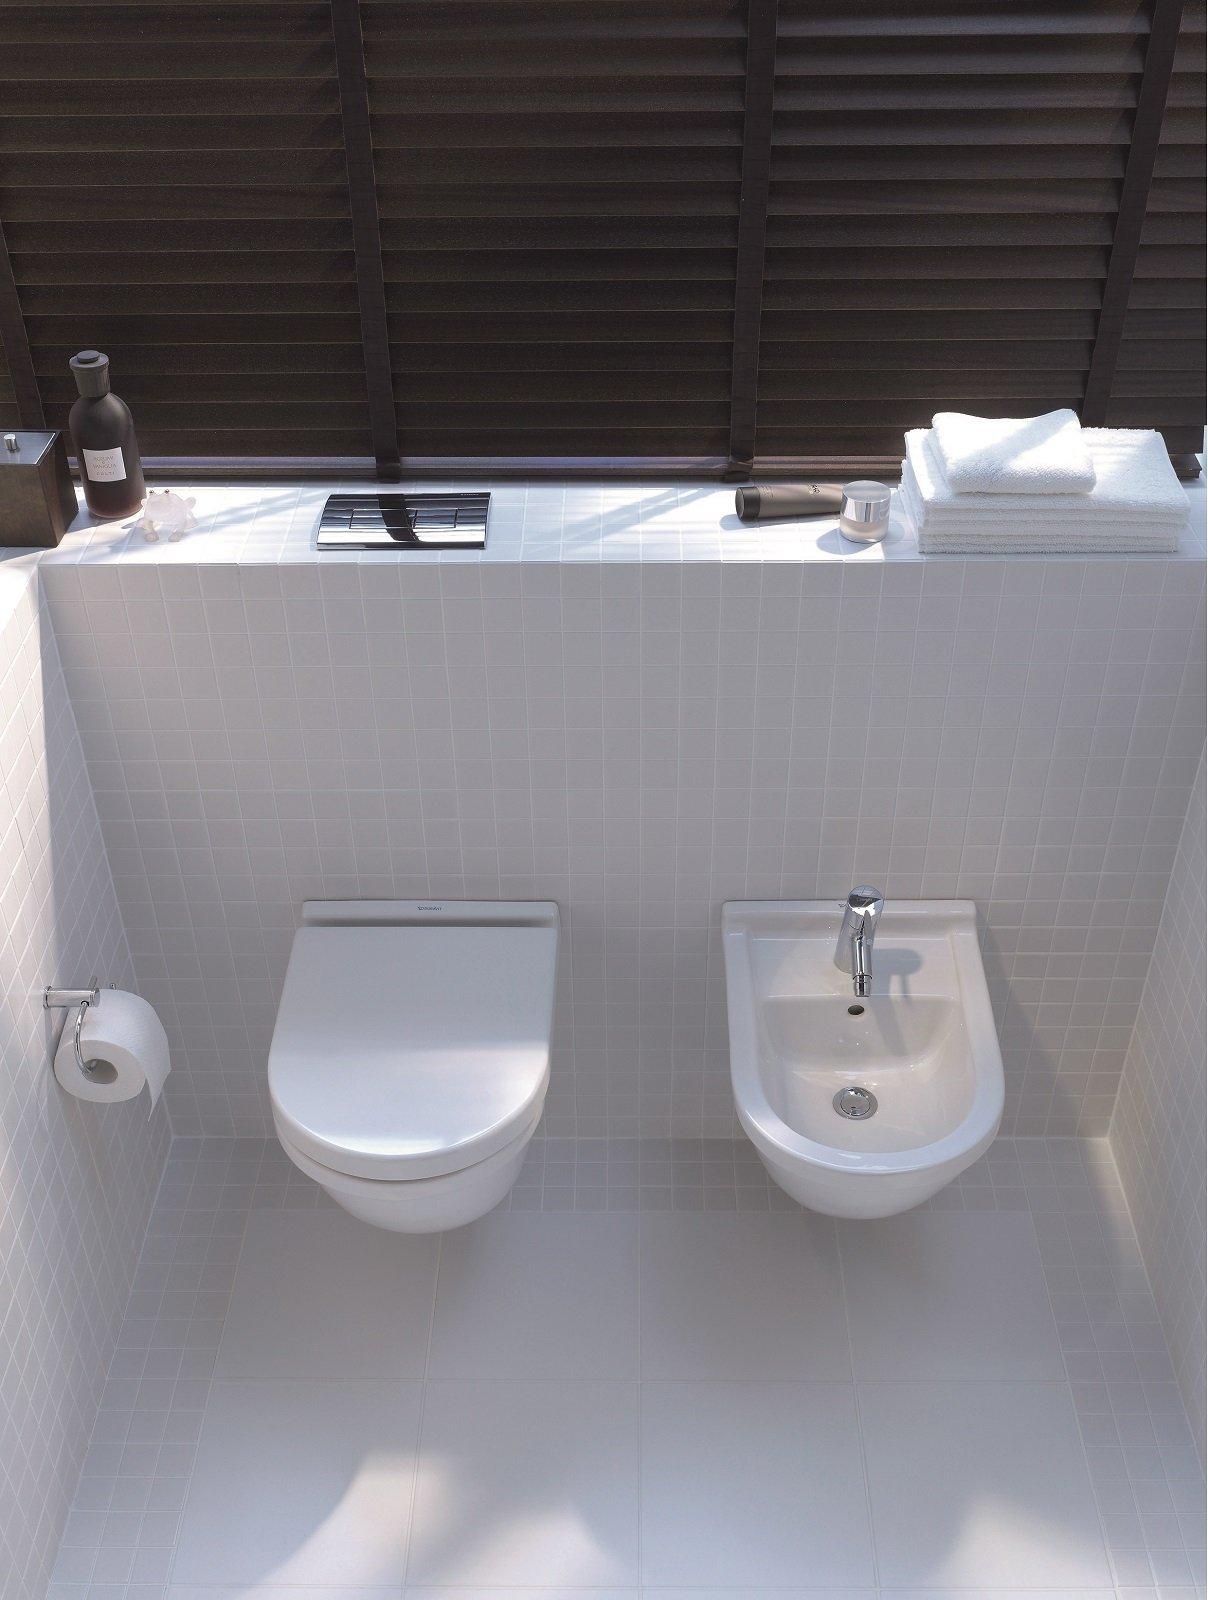 7 duravit compact starck3 sanitari salvaspazio cose di casa - Sanitari bagno piccoli ...